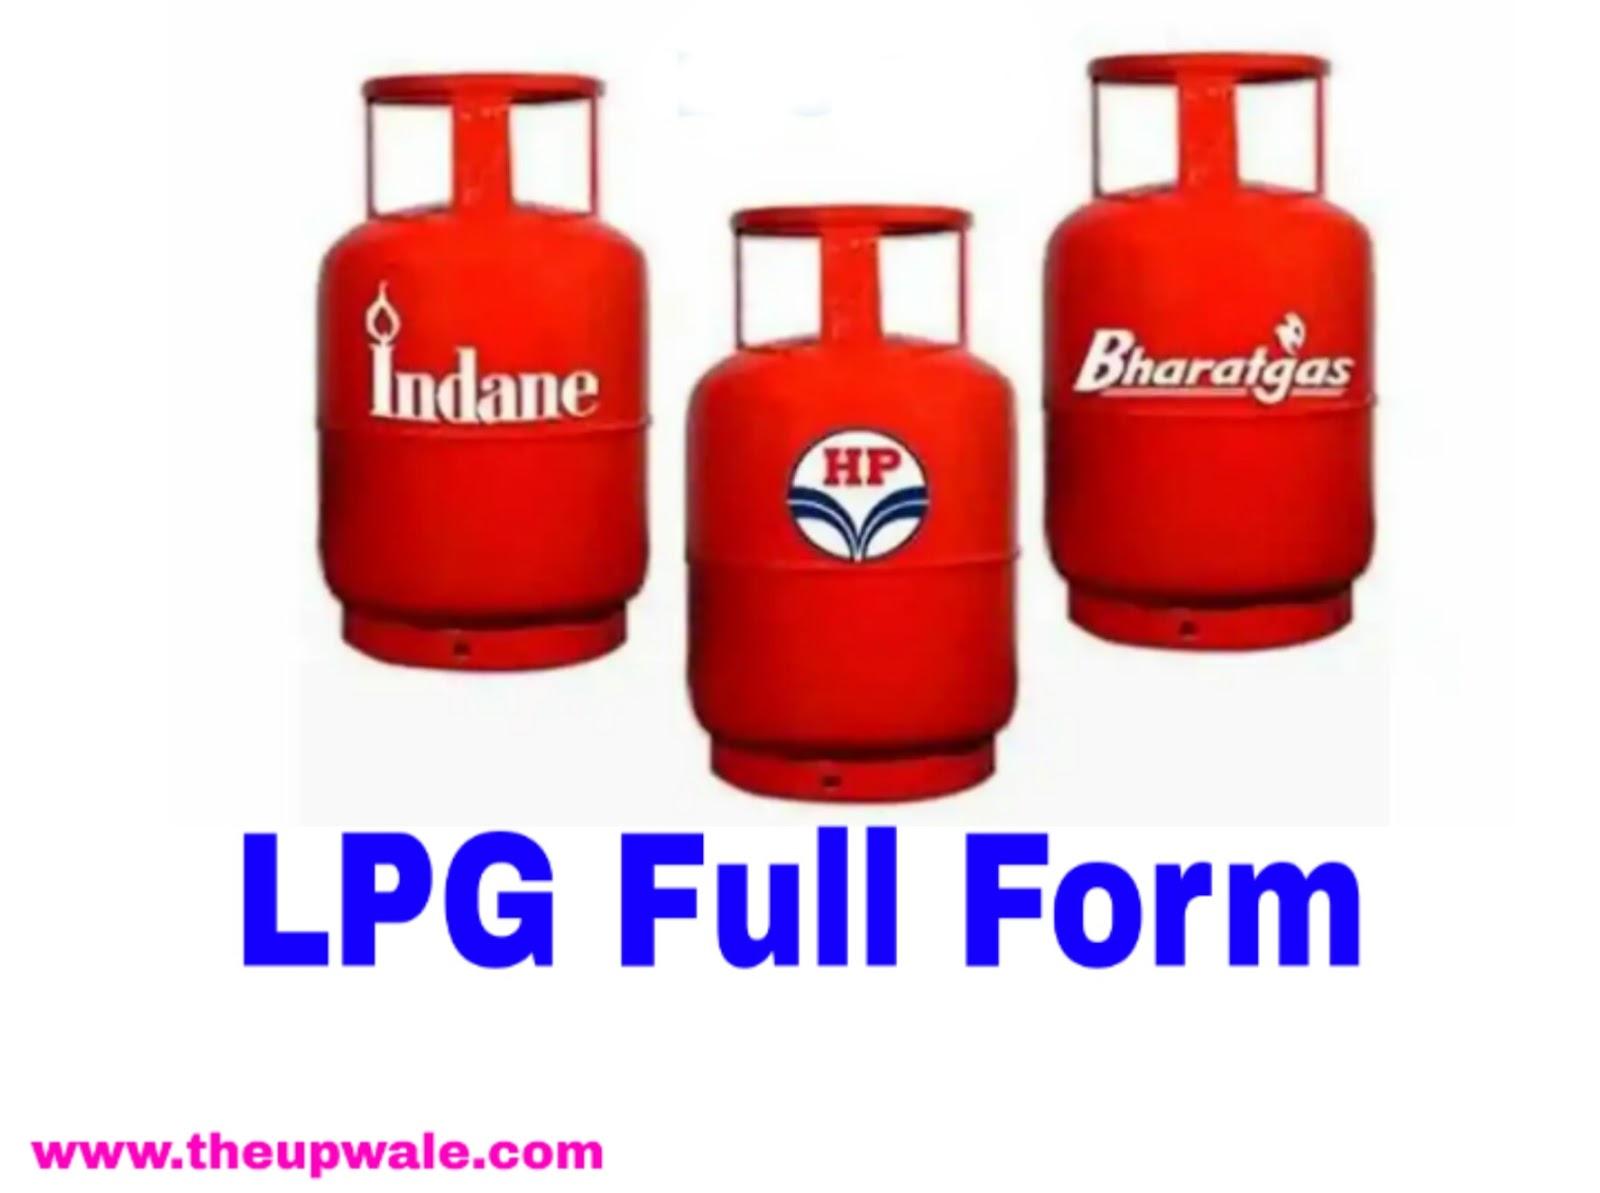 LPG Full Form in Hindi